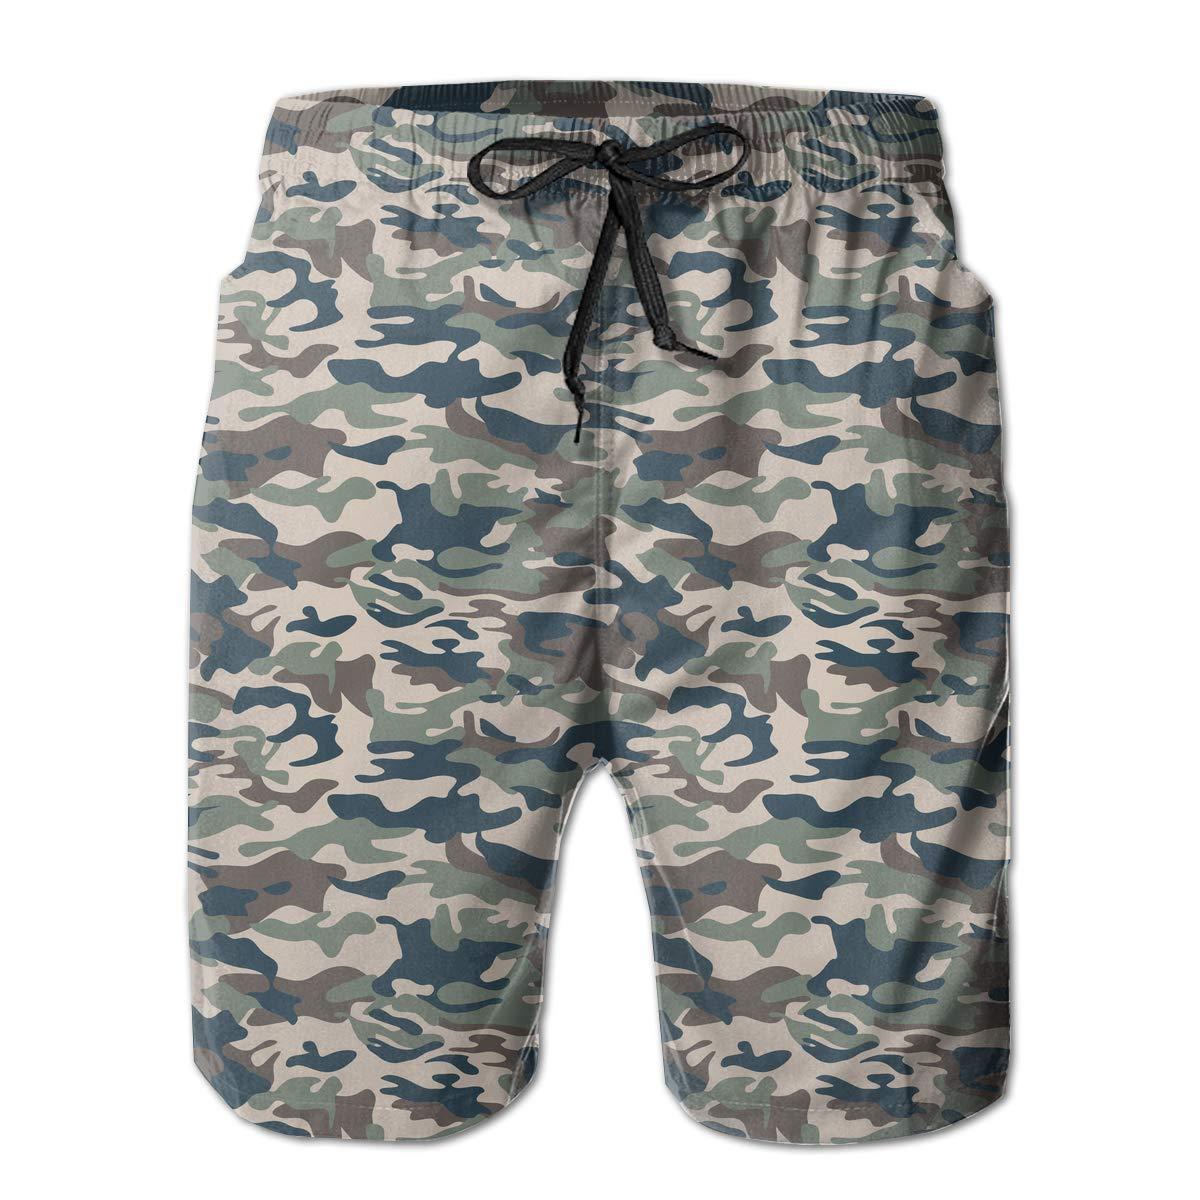 UHT28DG Abstract Camouflage Pattern Mens Boardshorts Surf Yoga Bathing Suit